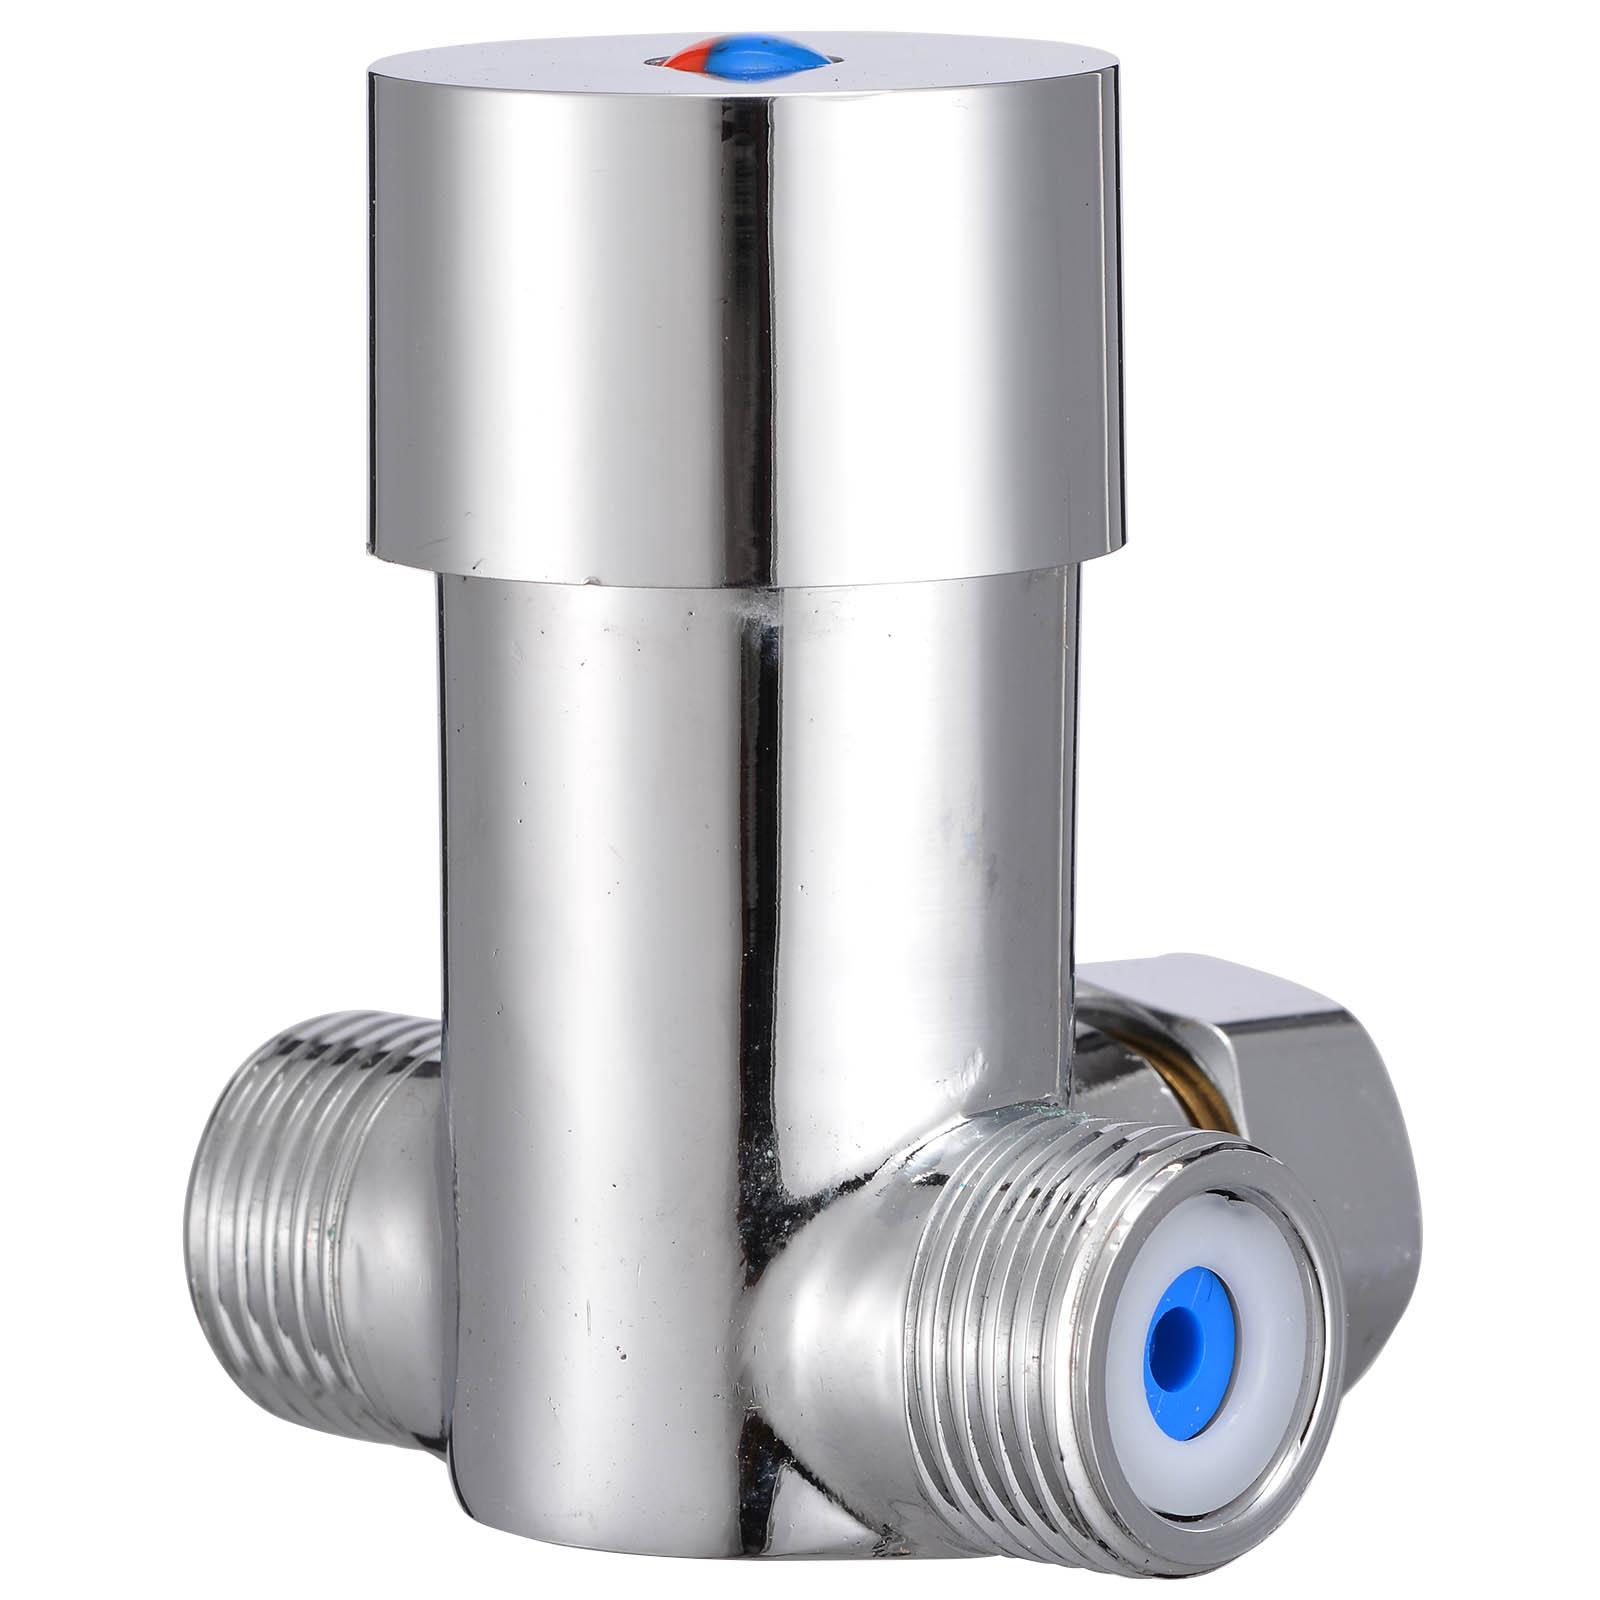 Hot Cold Water Valve Temperature Control Thermostatic Mixer Mixing Valve Sensor Tap For Home Improvement Tool